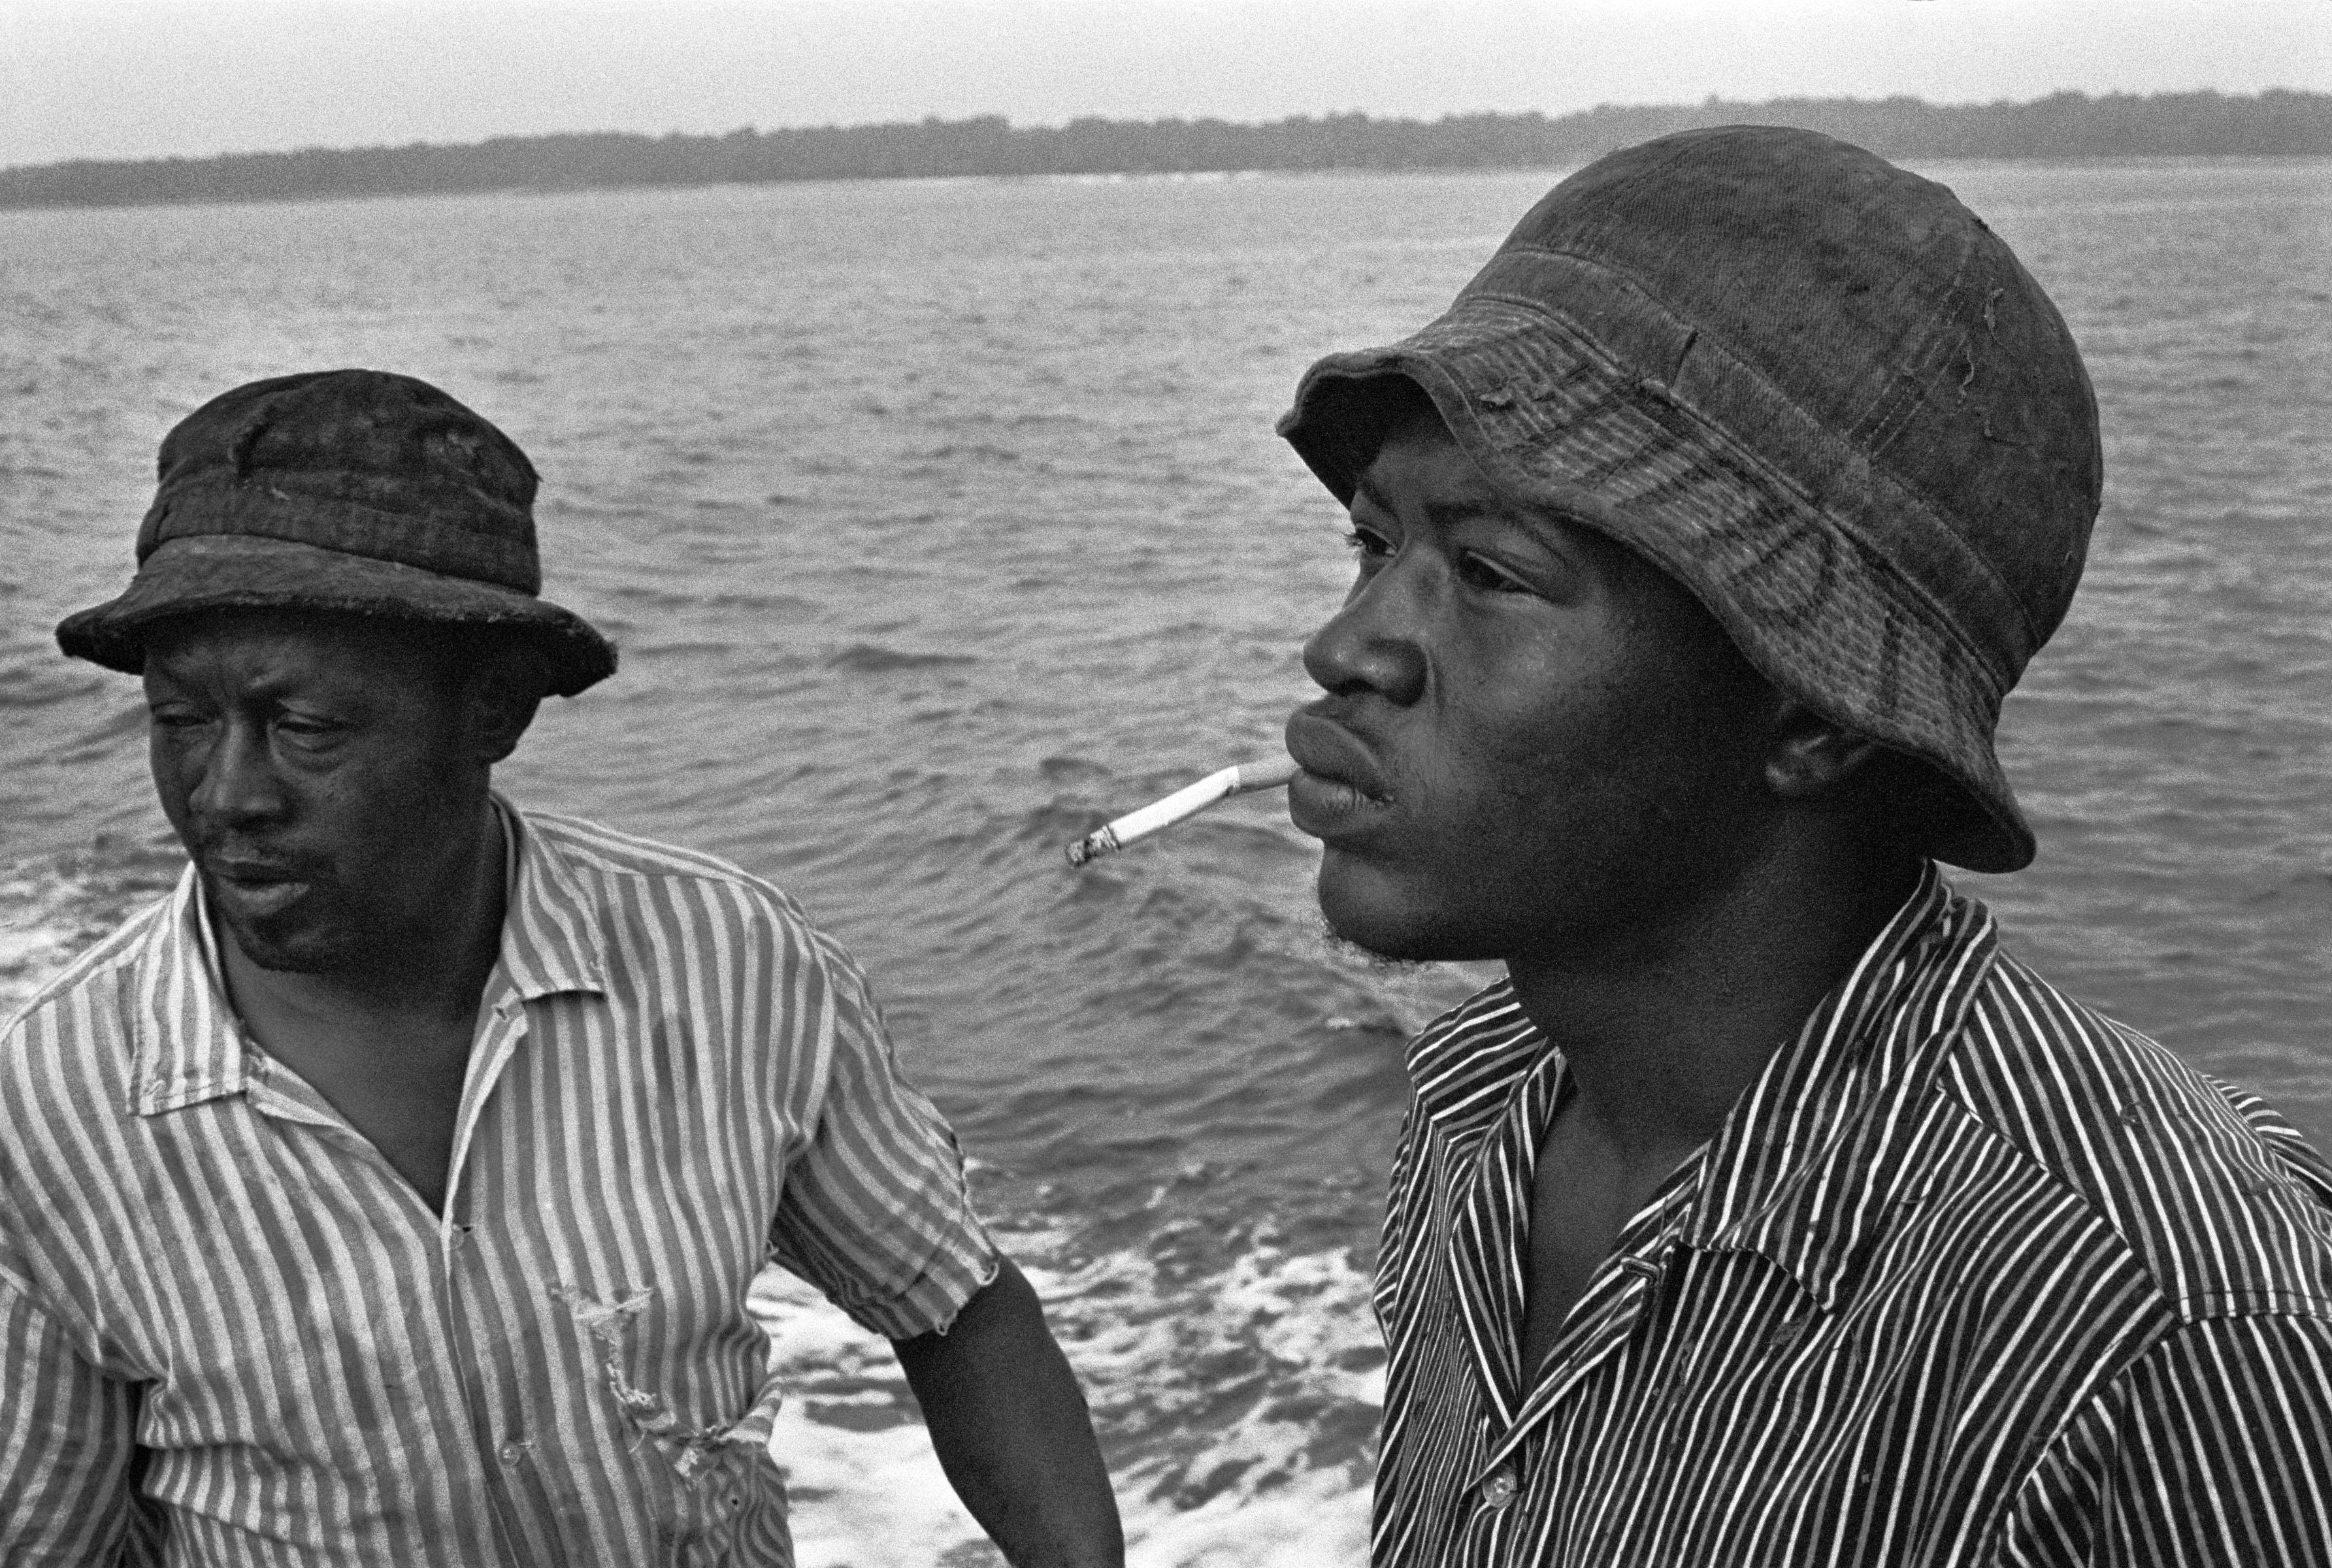 African American Art, African American Photography, African American News, Black Art, Black Photography, Jeanne Moutoussamy-Ashe, KOLUMN Magazine, KOLUMN